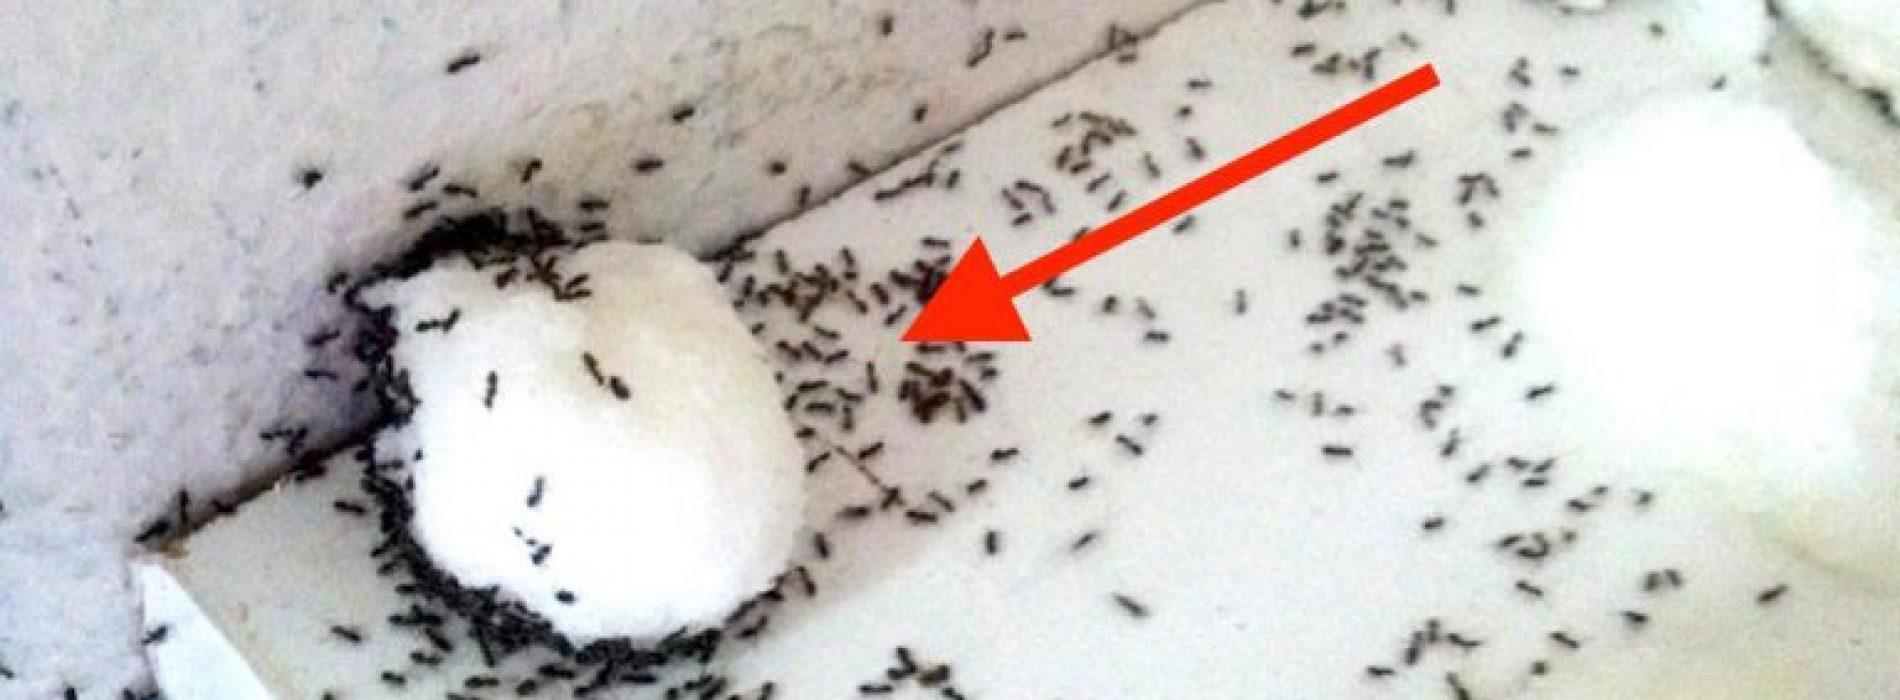 Mieren overlast? Met dit handig recept kom je die vervelende mieren af!